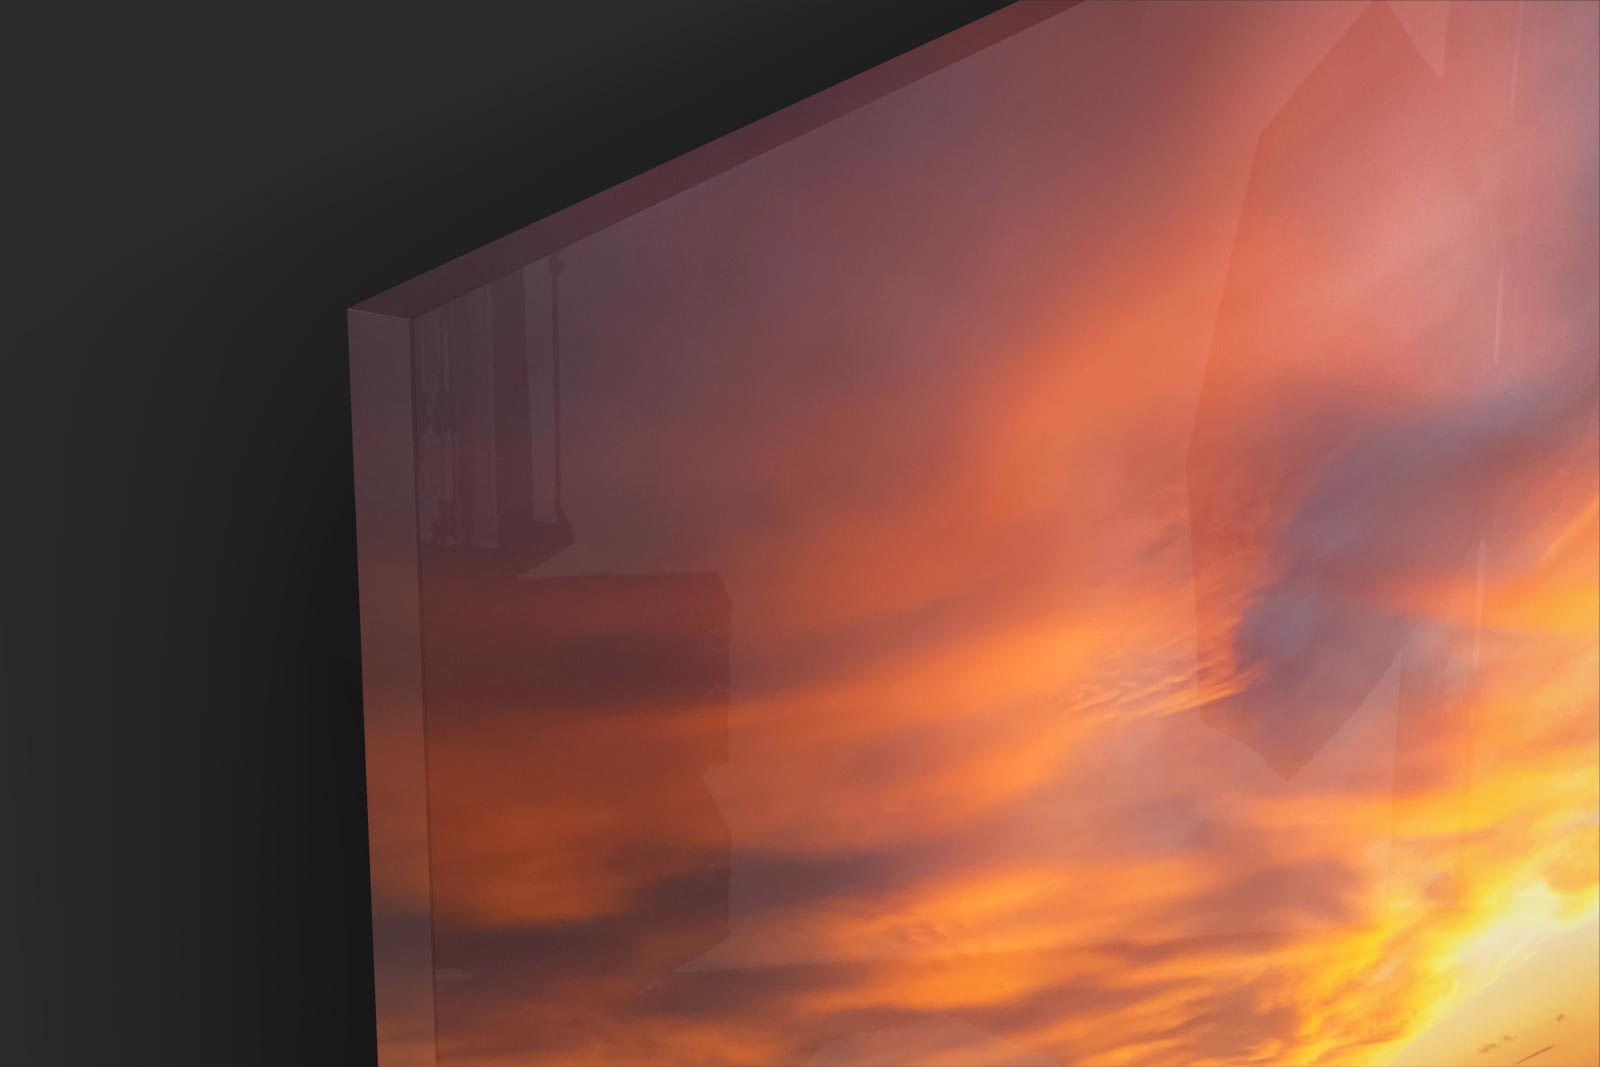 Mount-Bay-Sunset-Close Left.jpg